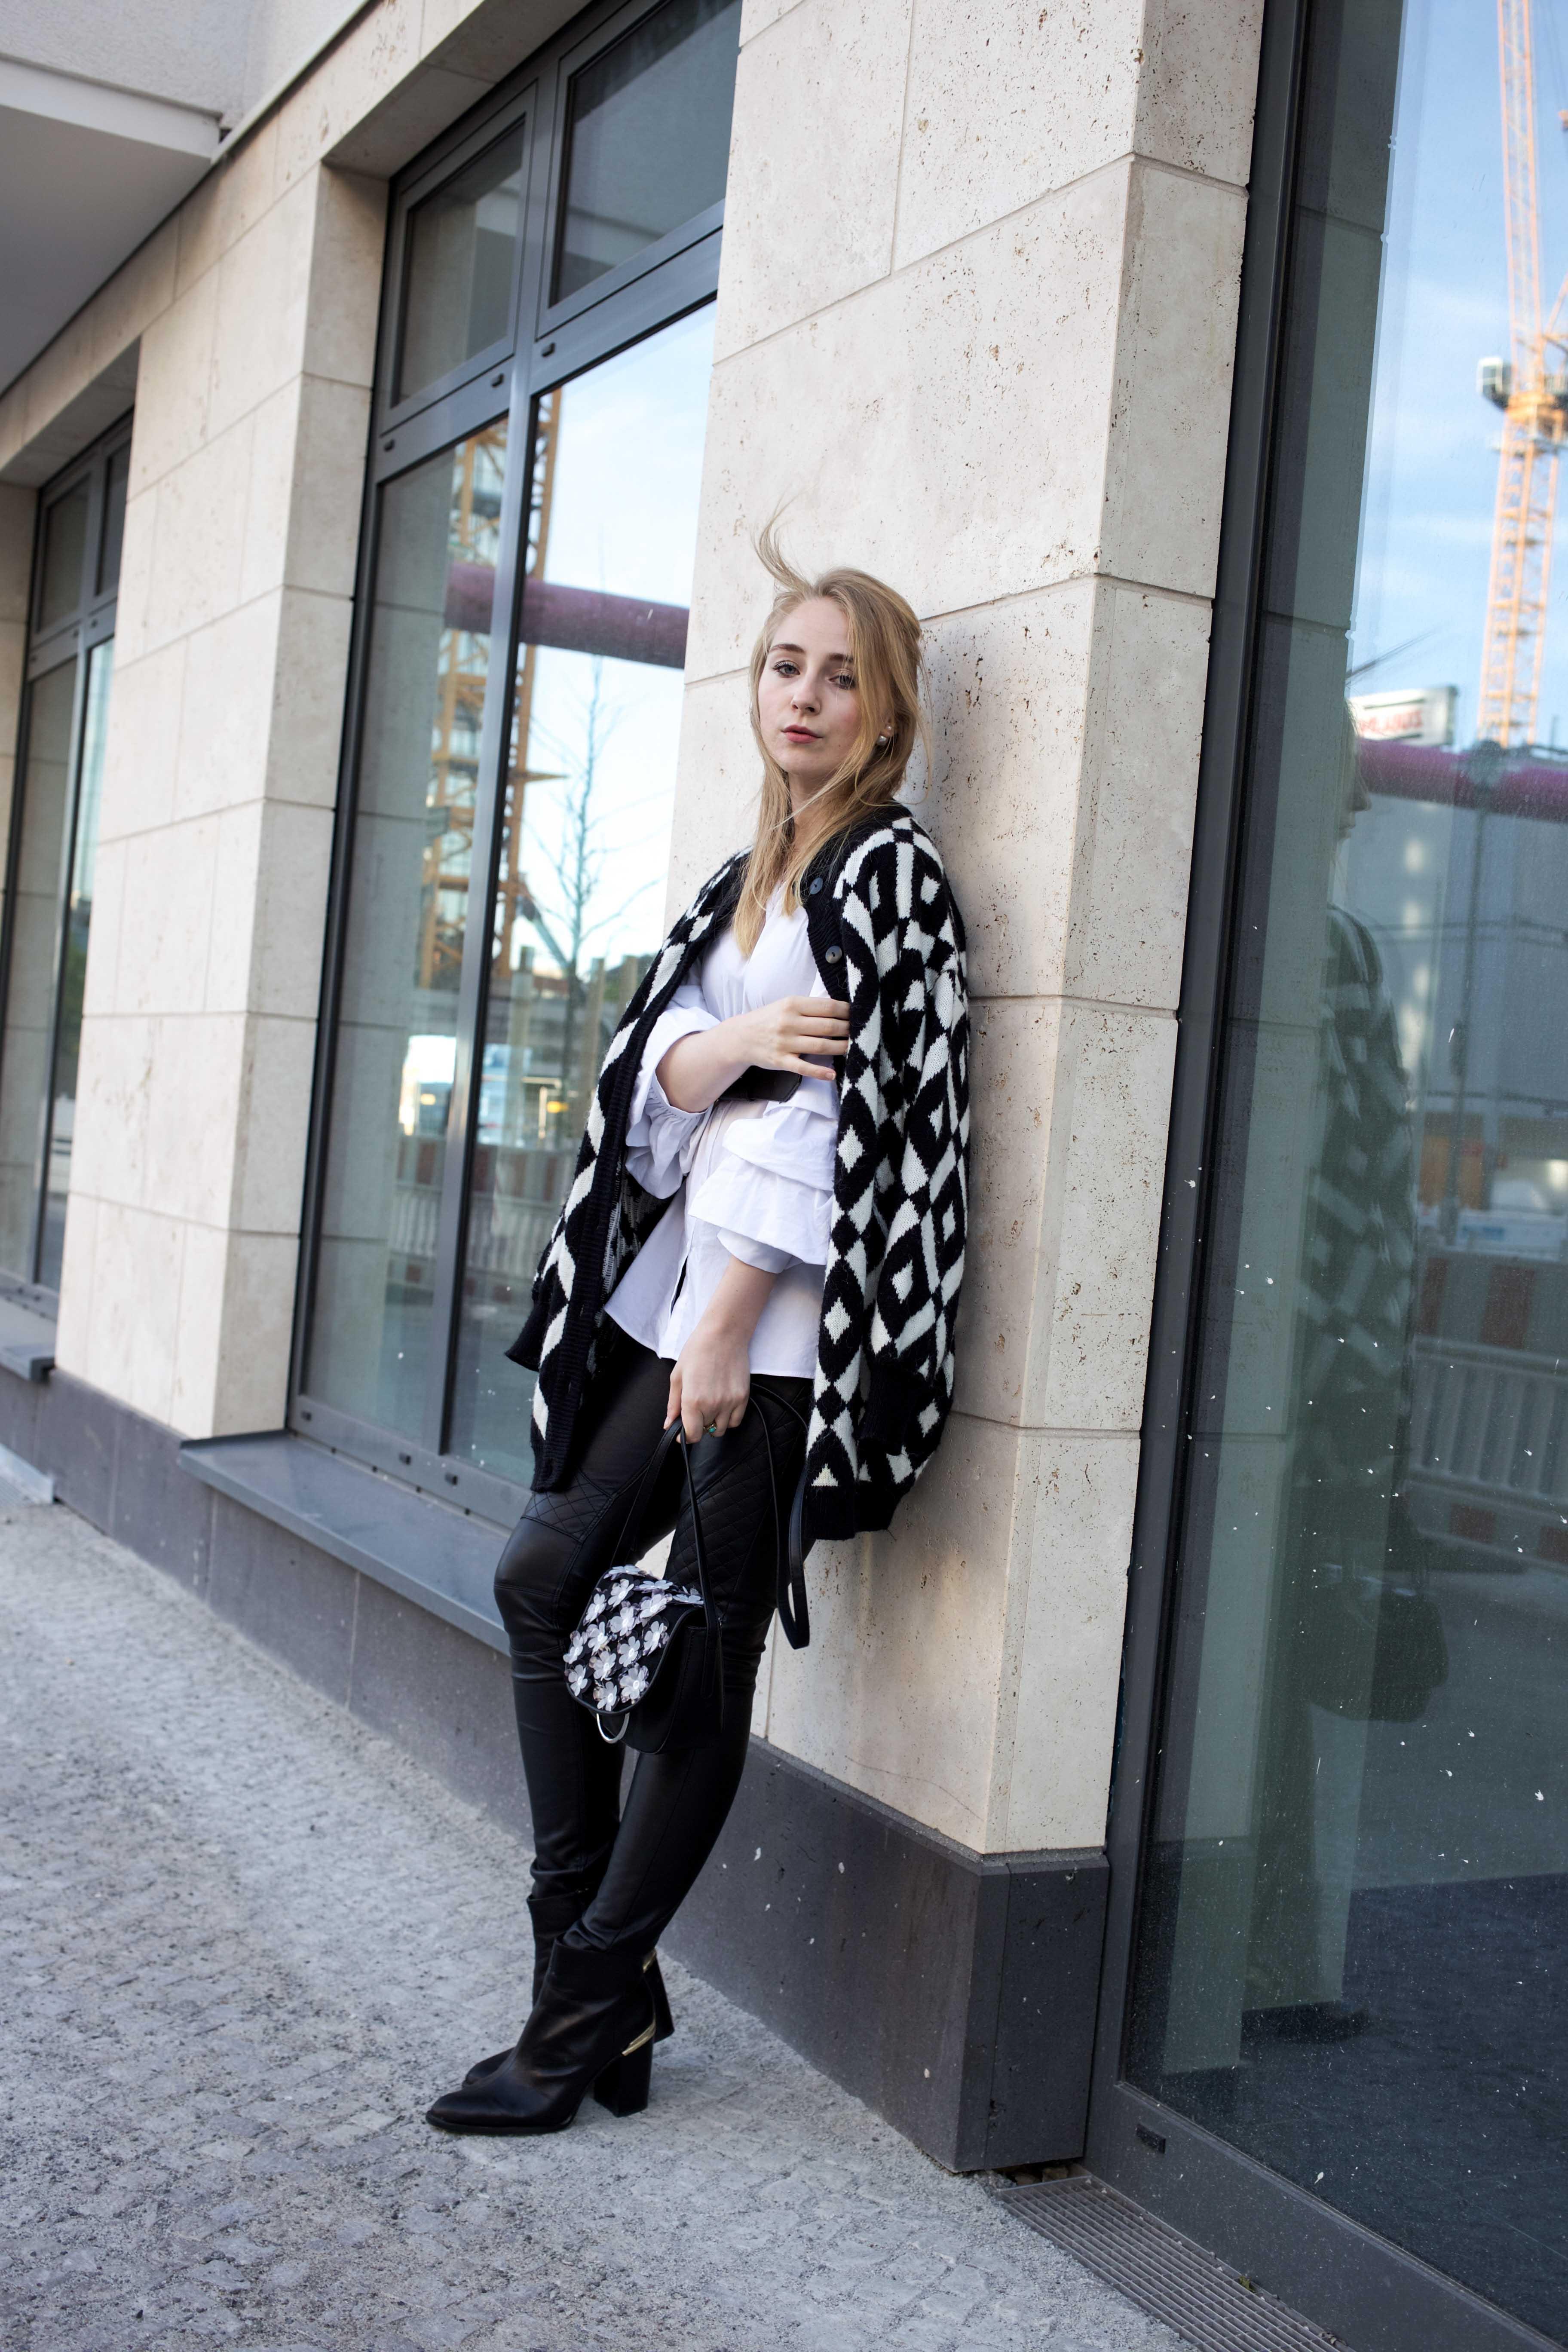 trendreport-weiße-bluse-trompetenärmel-fashionblog-ootd-modeblog-berlin_8766